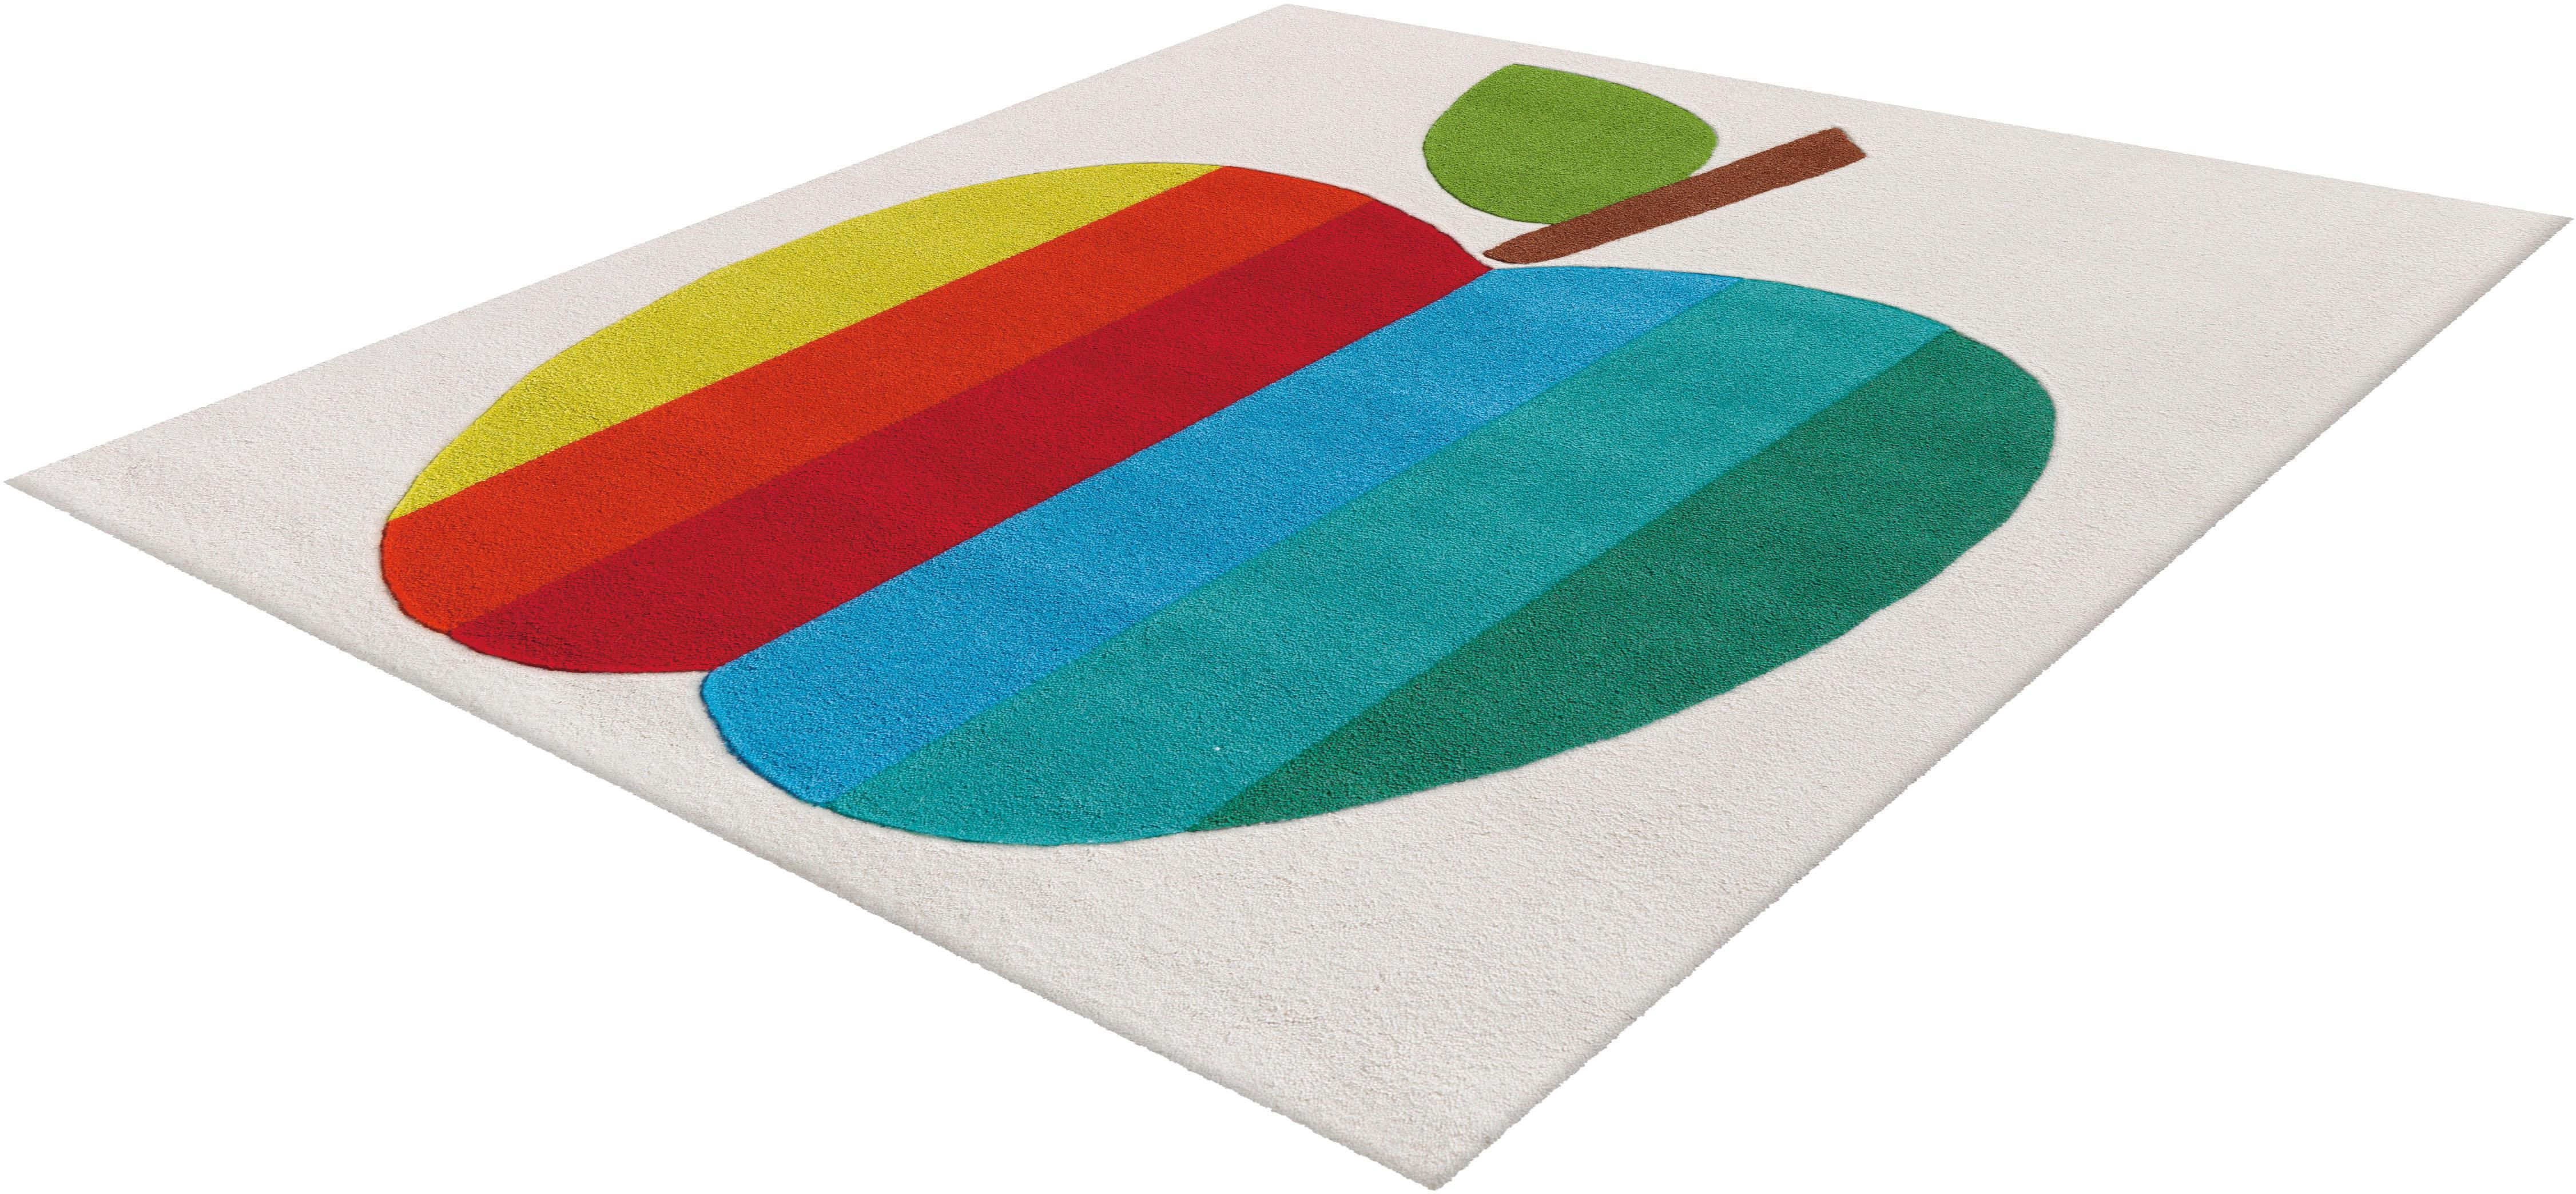 Arte Espina Kinderteppich Joy 4170, rechteckig, 16 mm Höhe bunt Kinder Bunte Kinderteppiche Teppiche